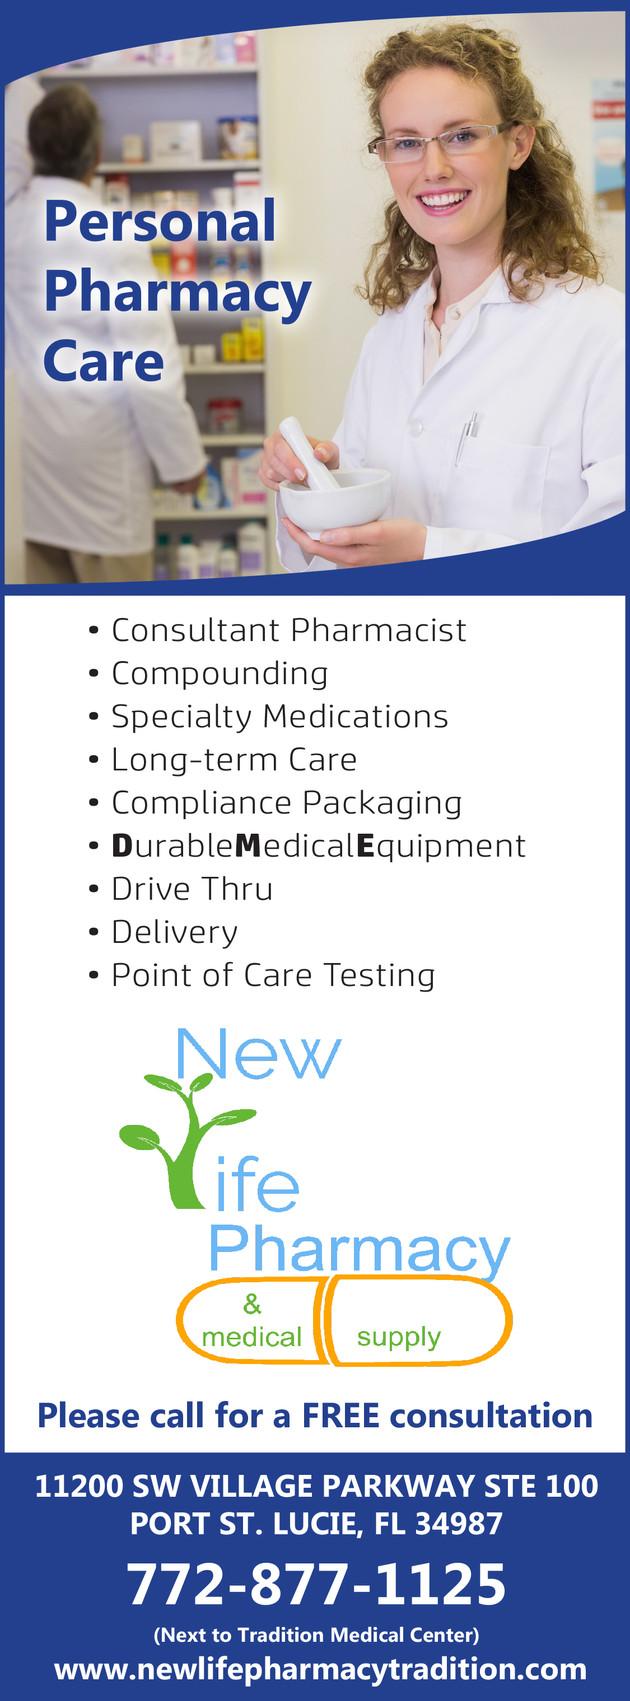 New Life Pharmacy